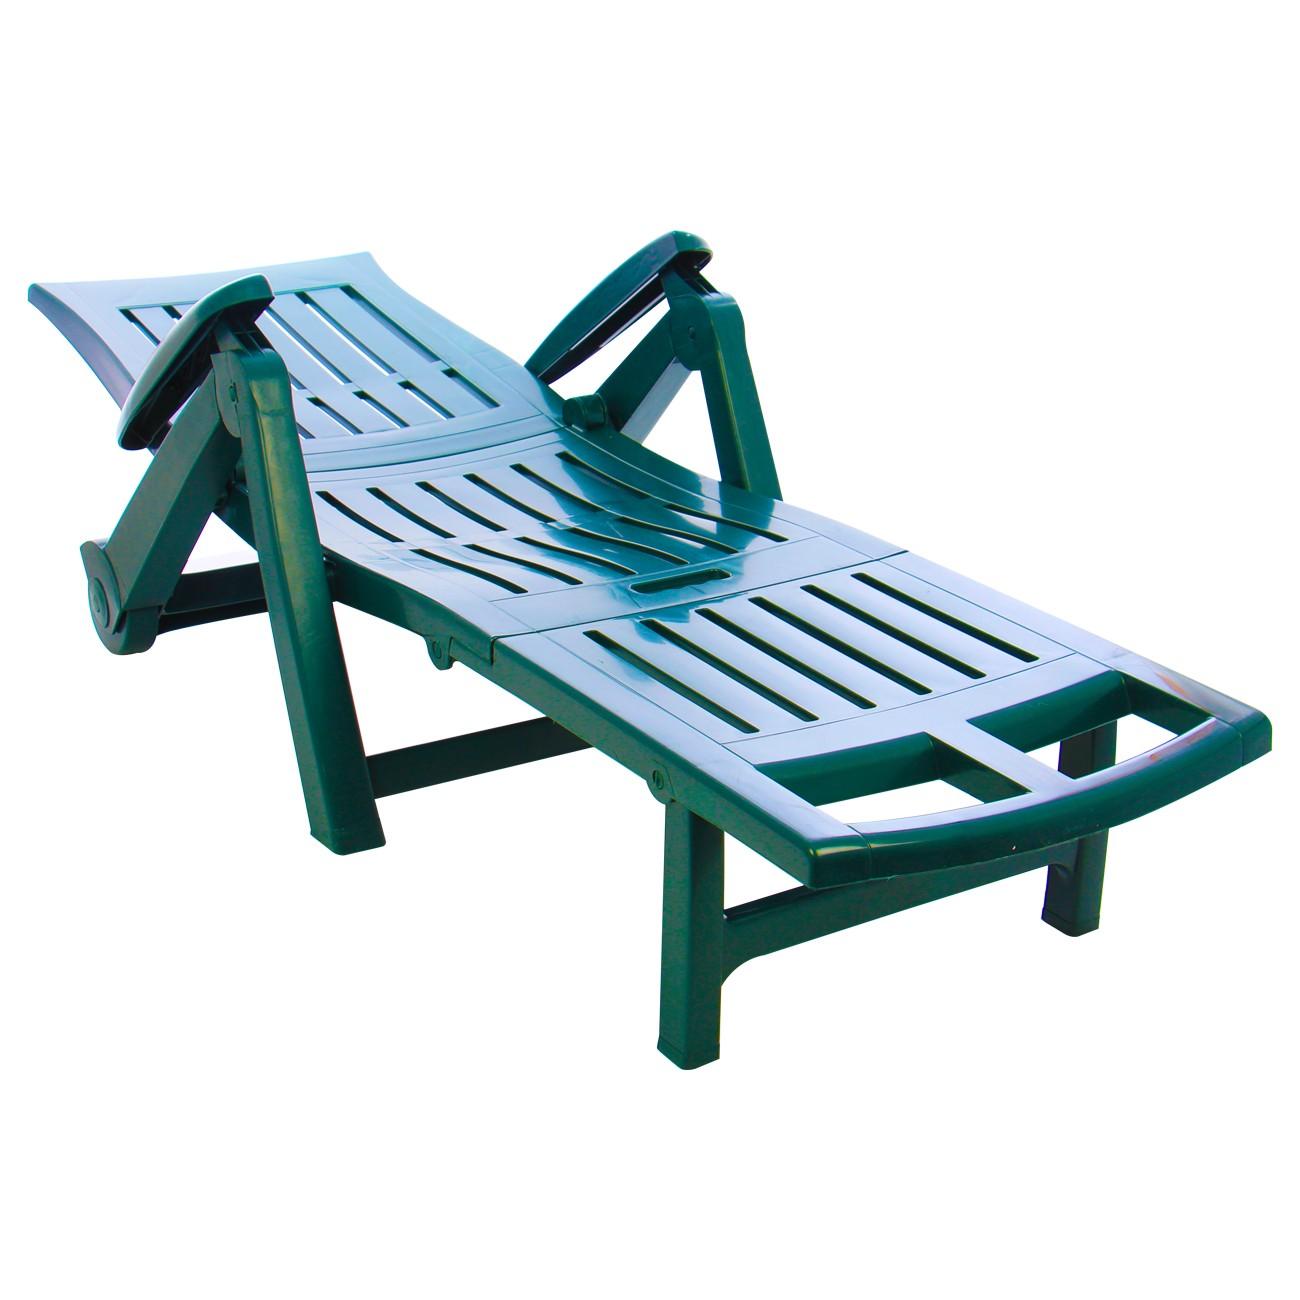 Sezlong plaja Zaffiro pliabil structura plastic verde 195 x 72 x 101 cm